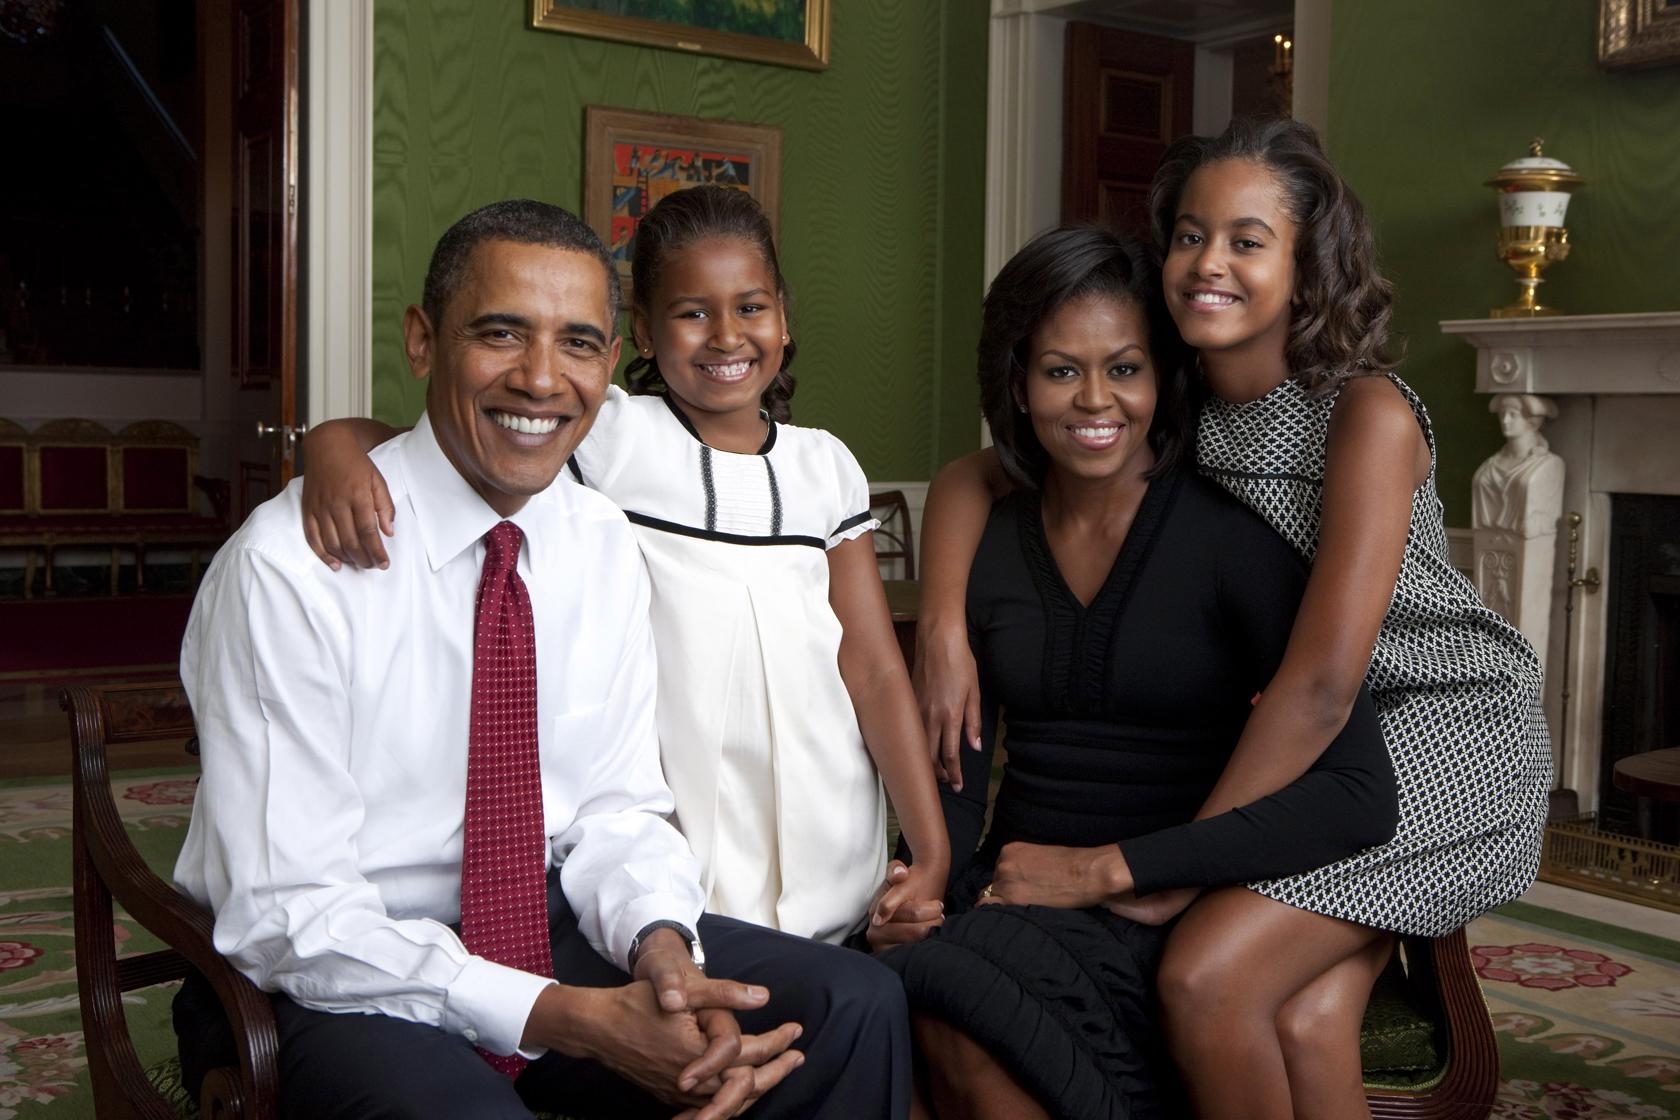 Obama Family portraits 2009 and 2011